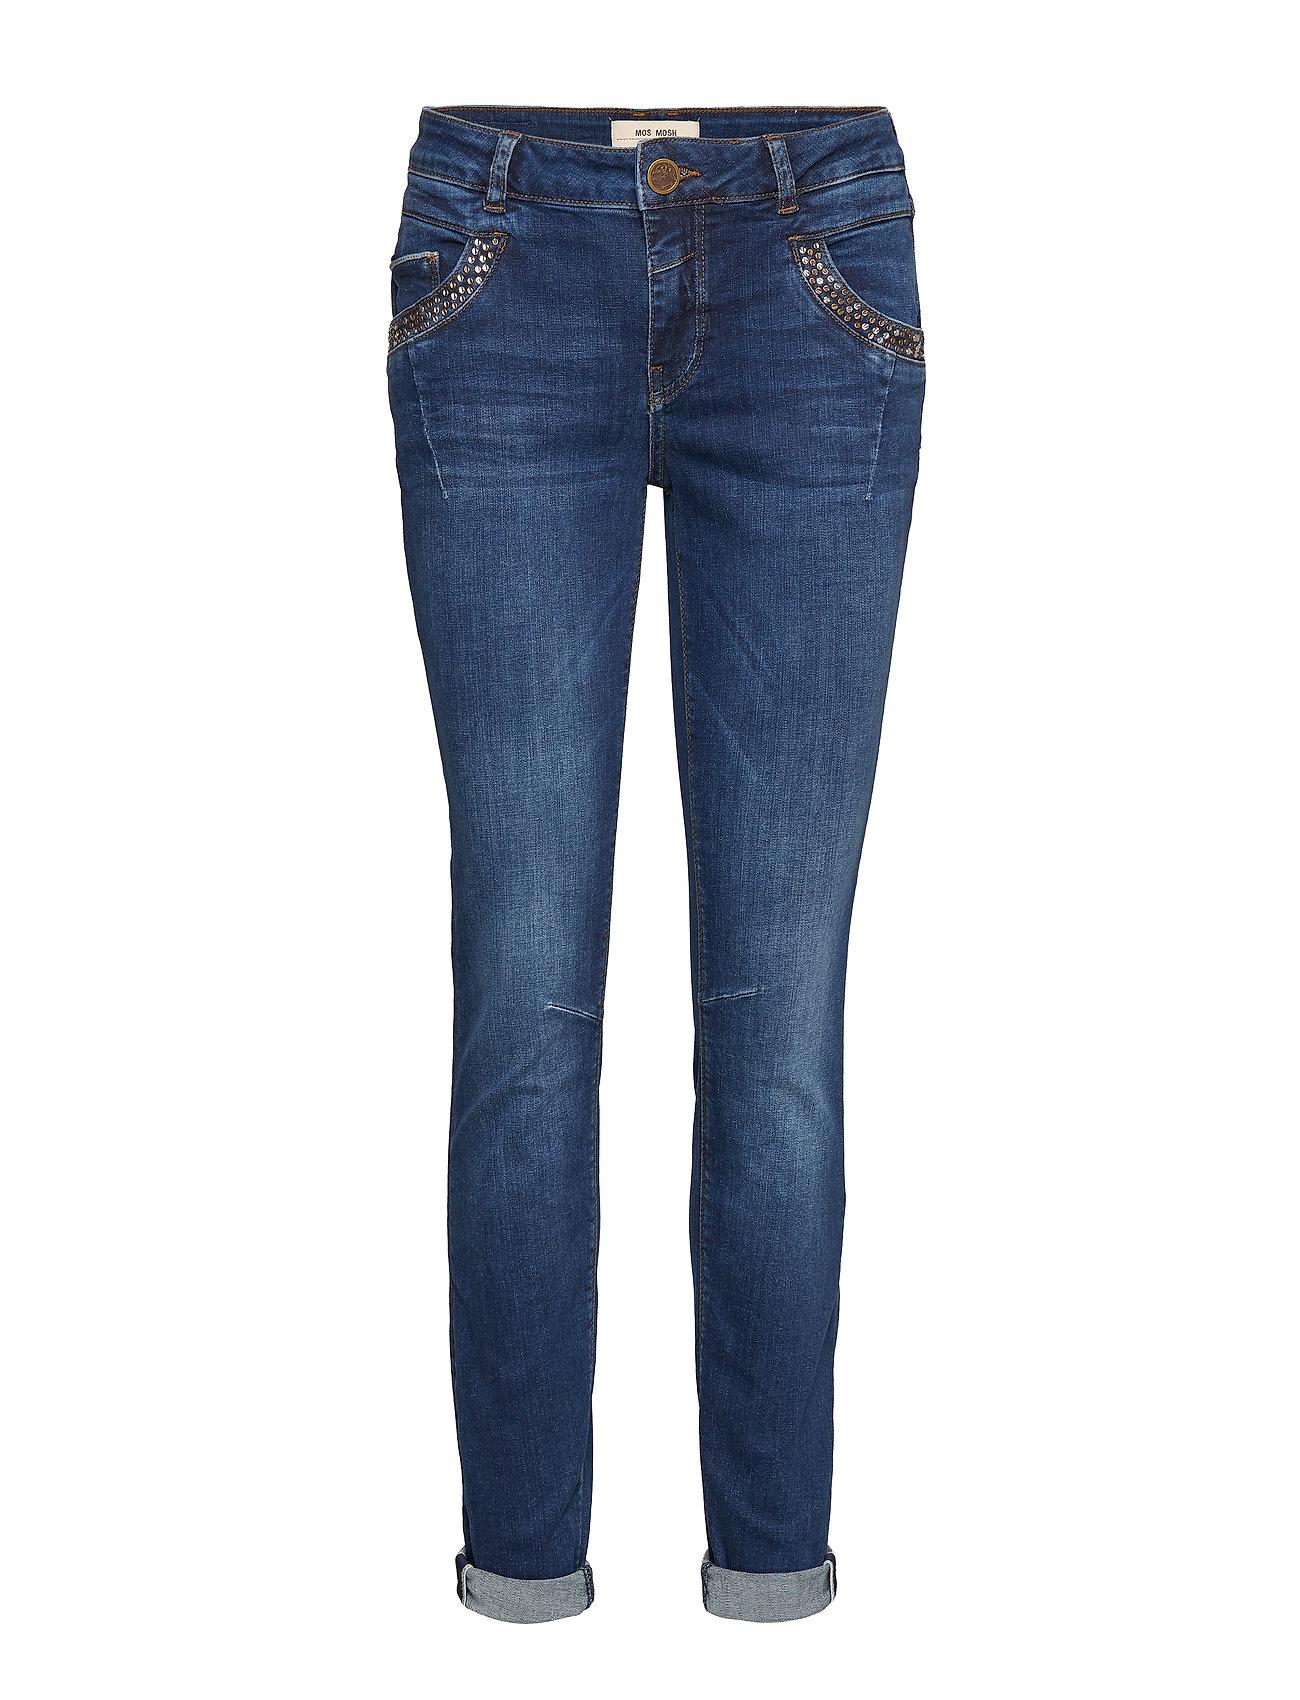 MOS MOSH Naomi Trok Jeans - BLUE DENIM